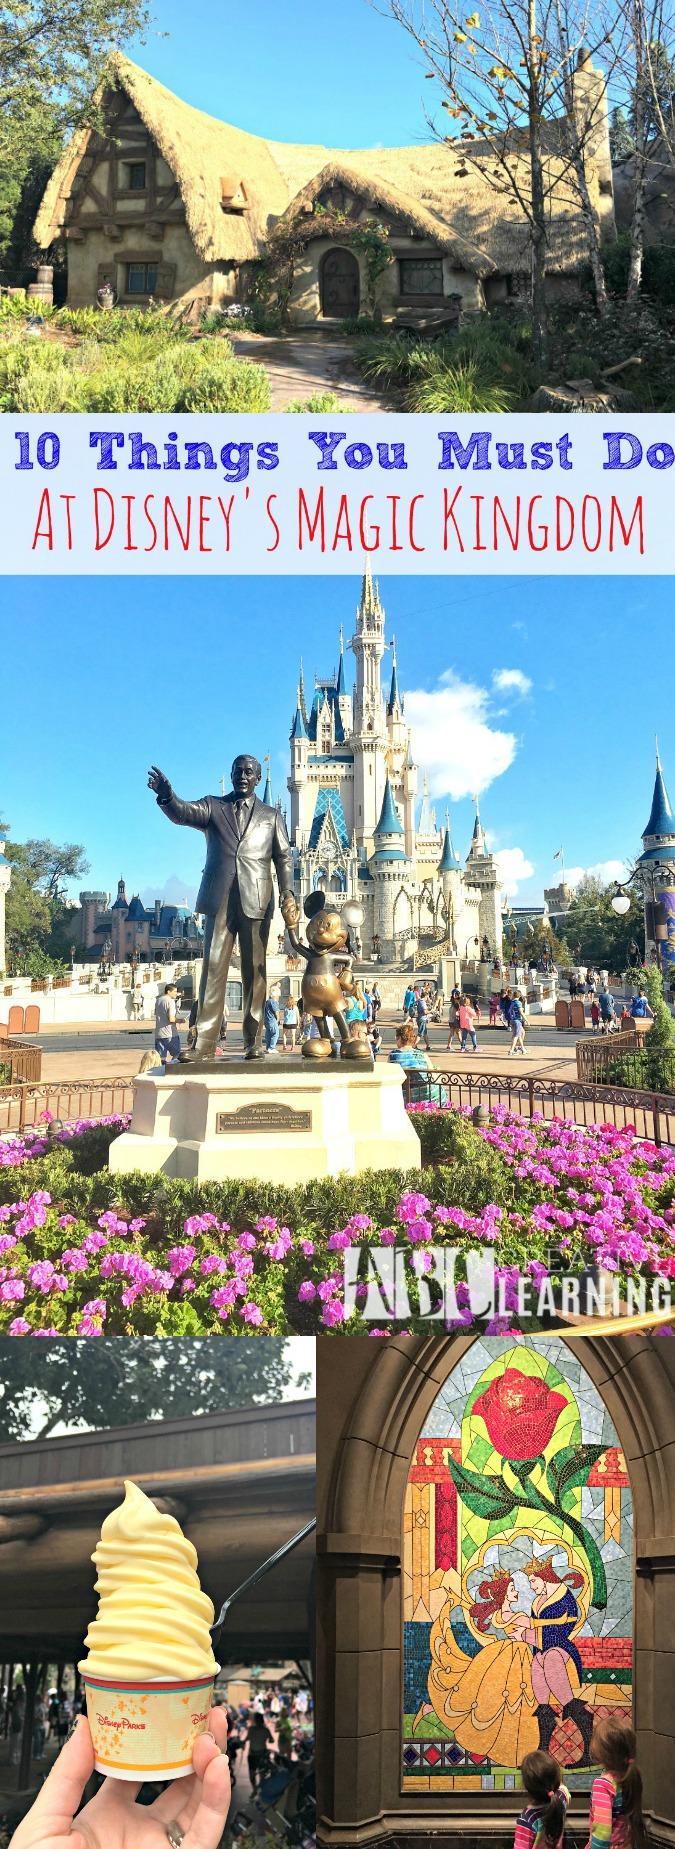 10 Things You Must Do At Disney's Magic Kingdom